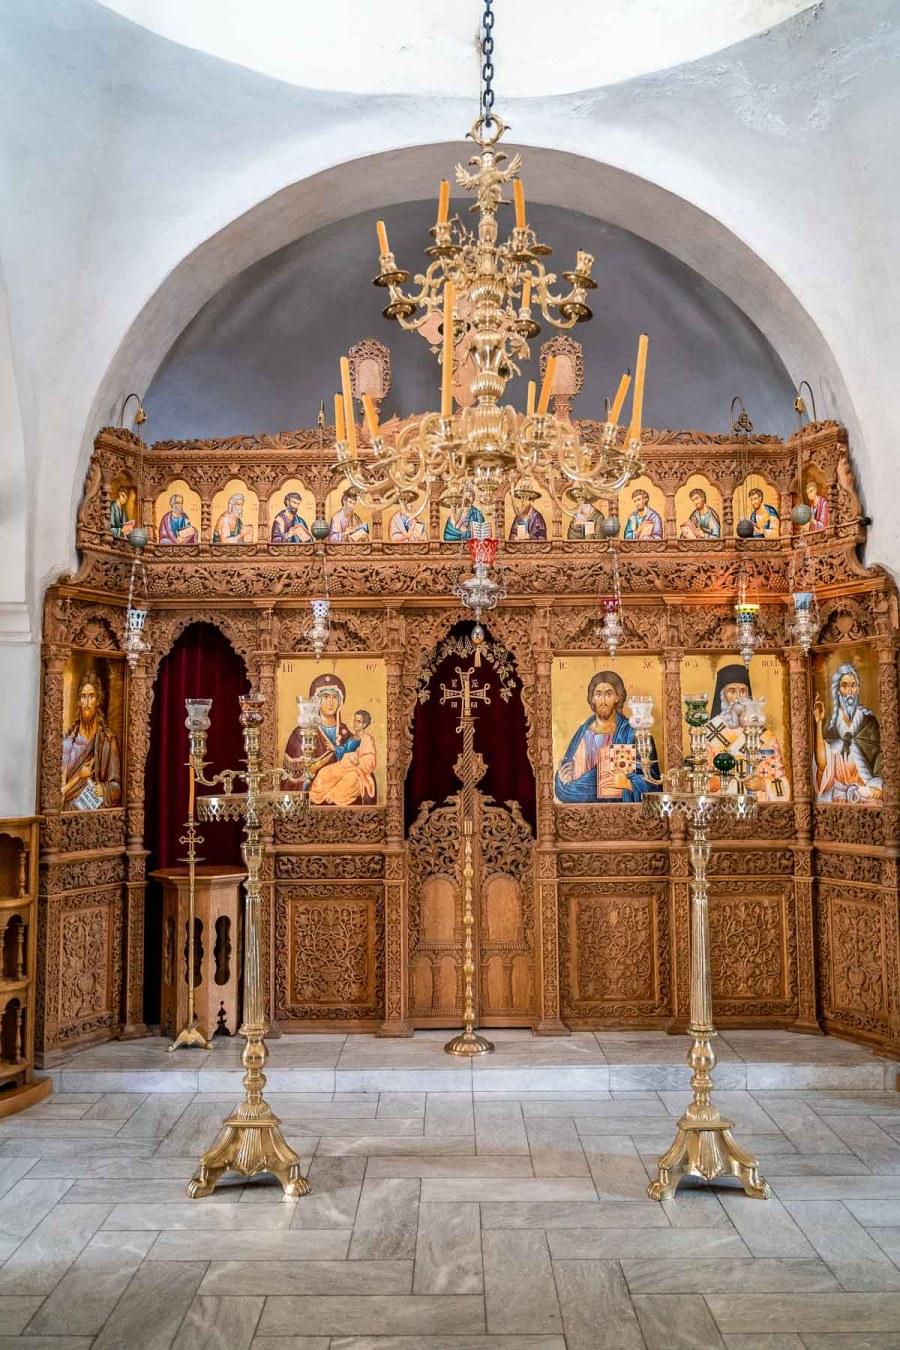 Monastery of Profitis Ilias in Santorini, Greece